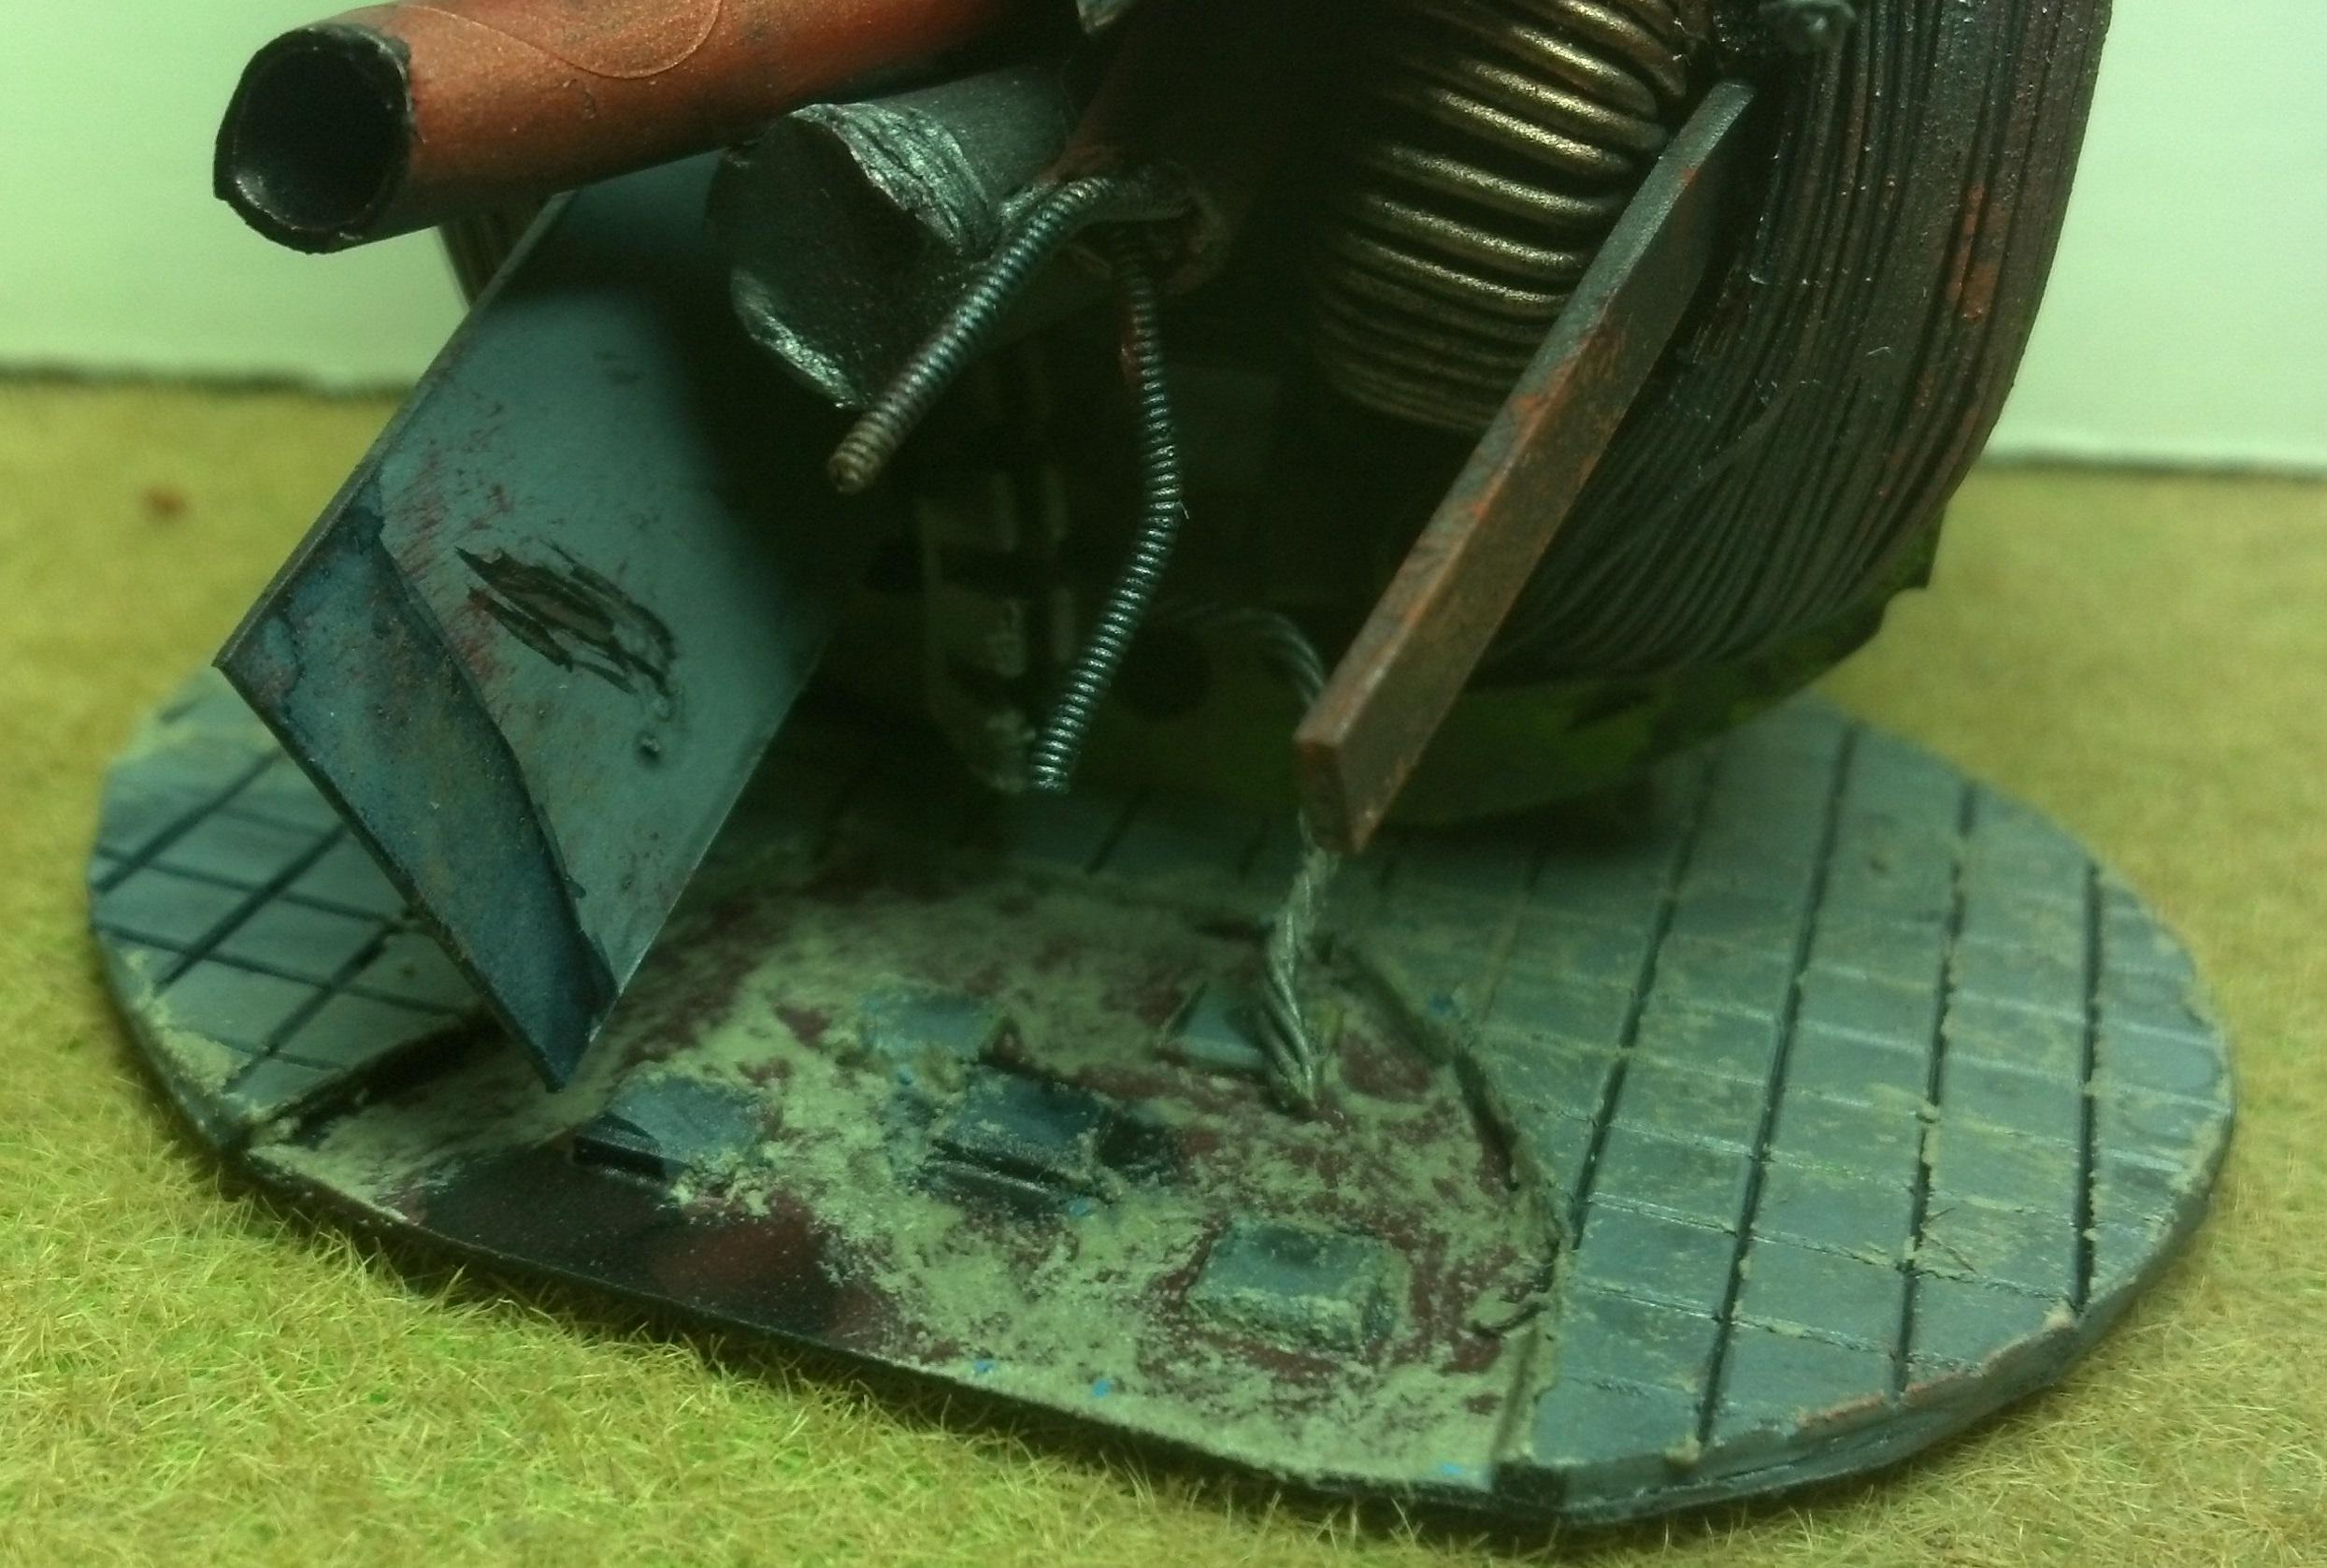 Chipping, Junk, Oil, Pile, Portal, Rust, Scratches, Terrain, Weathering Pigment